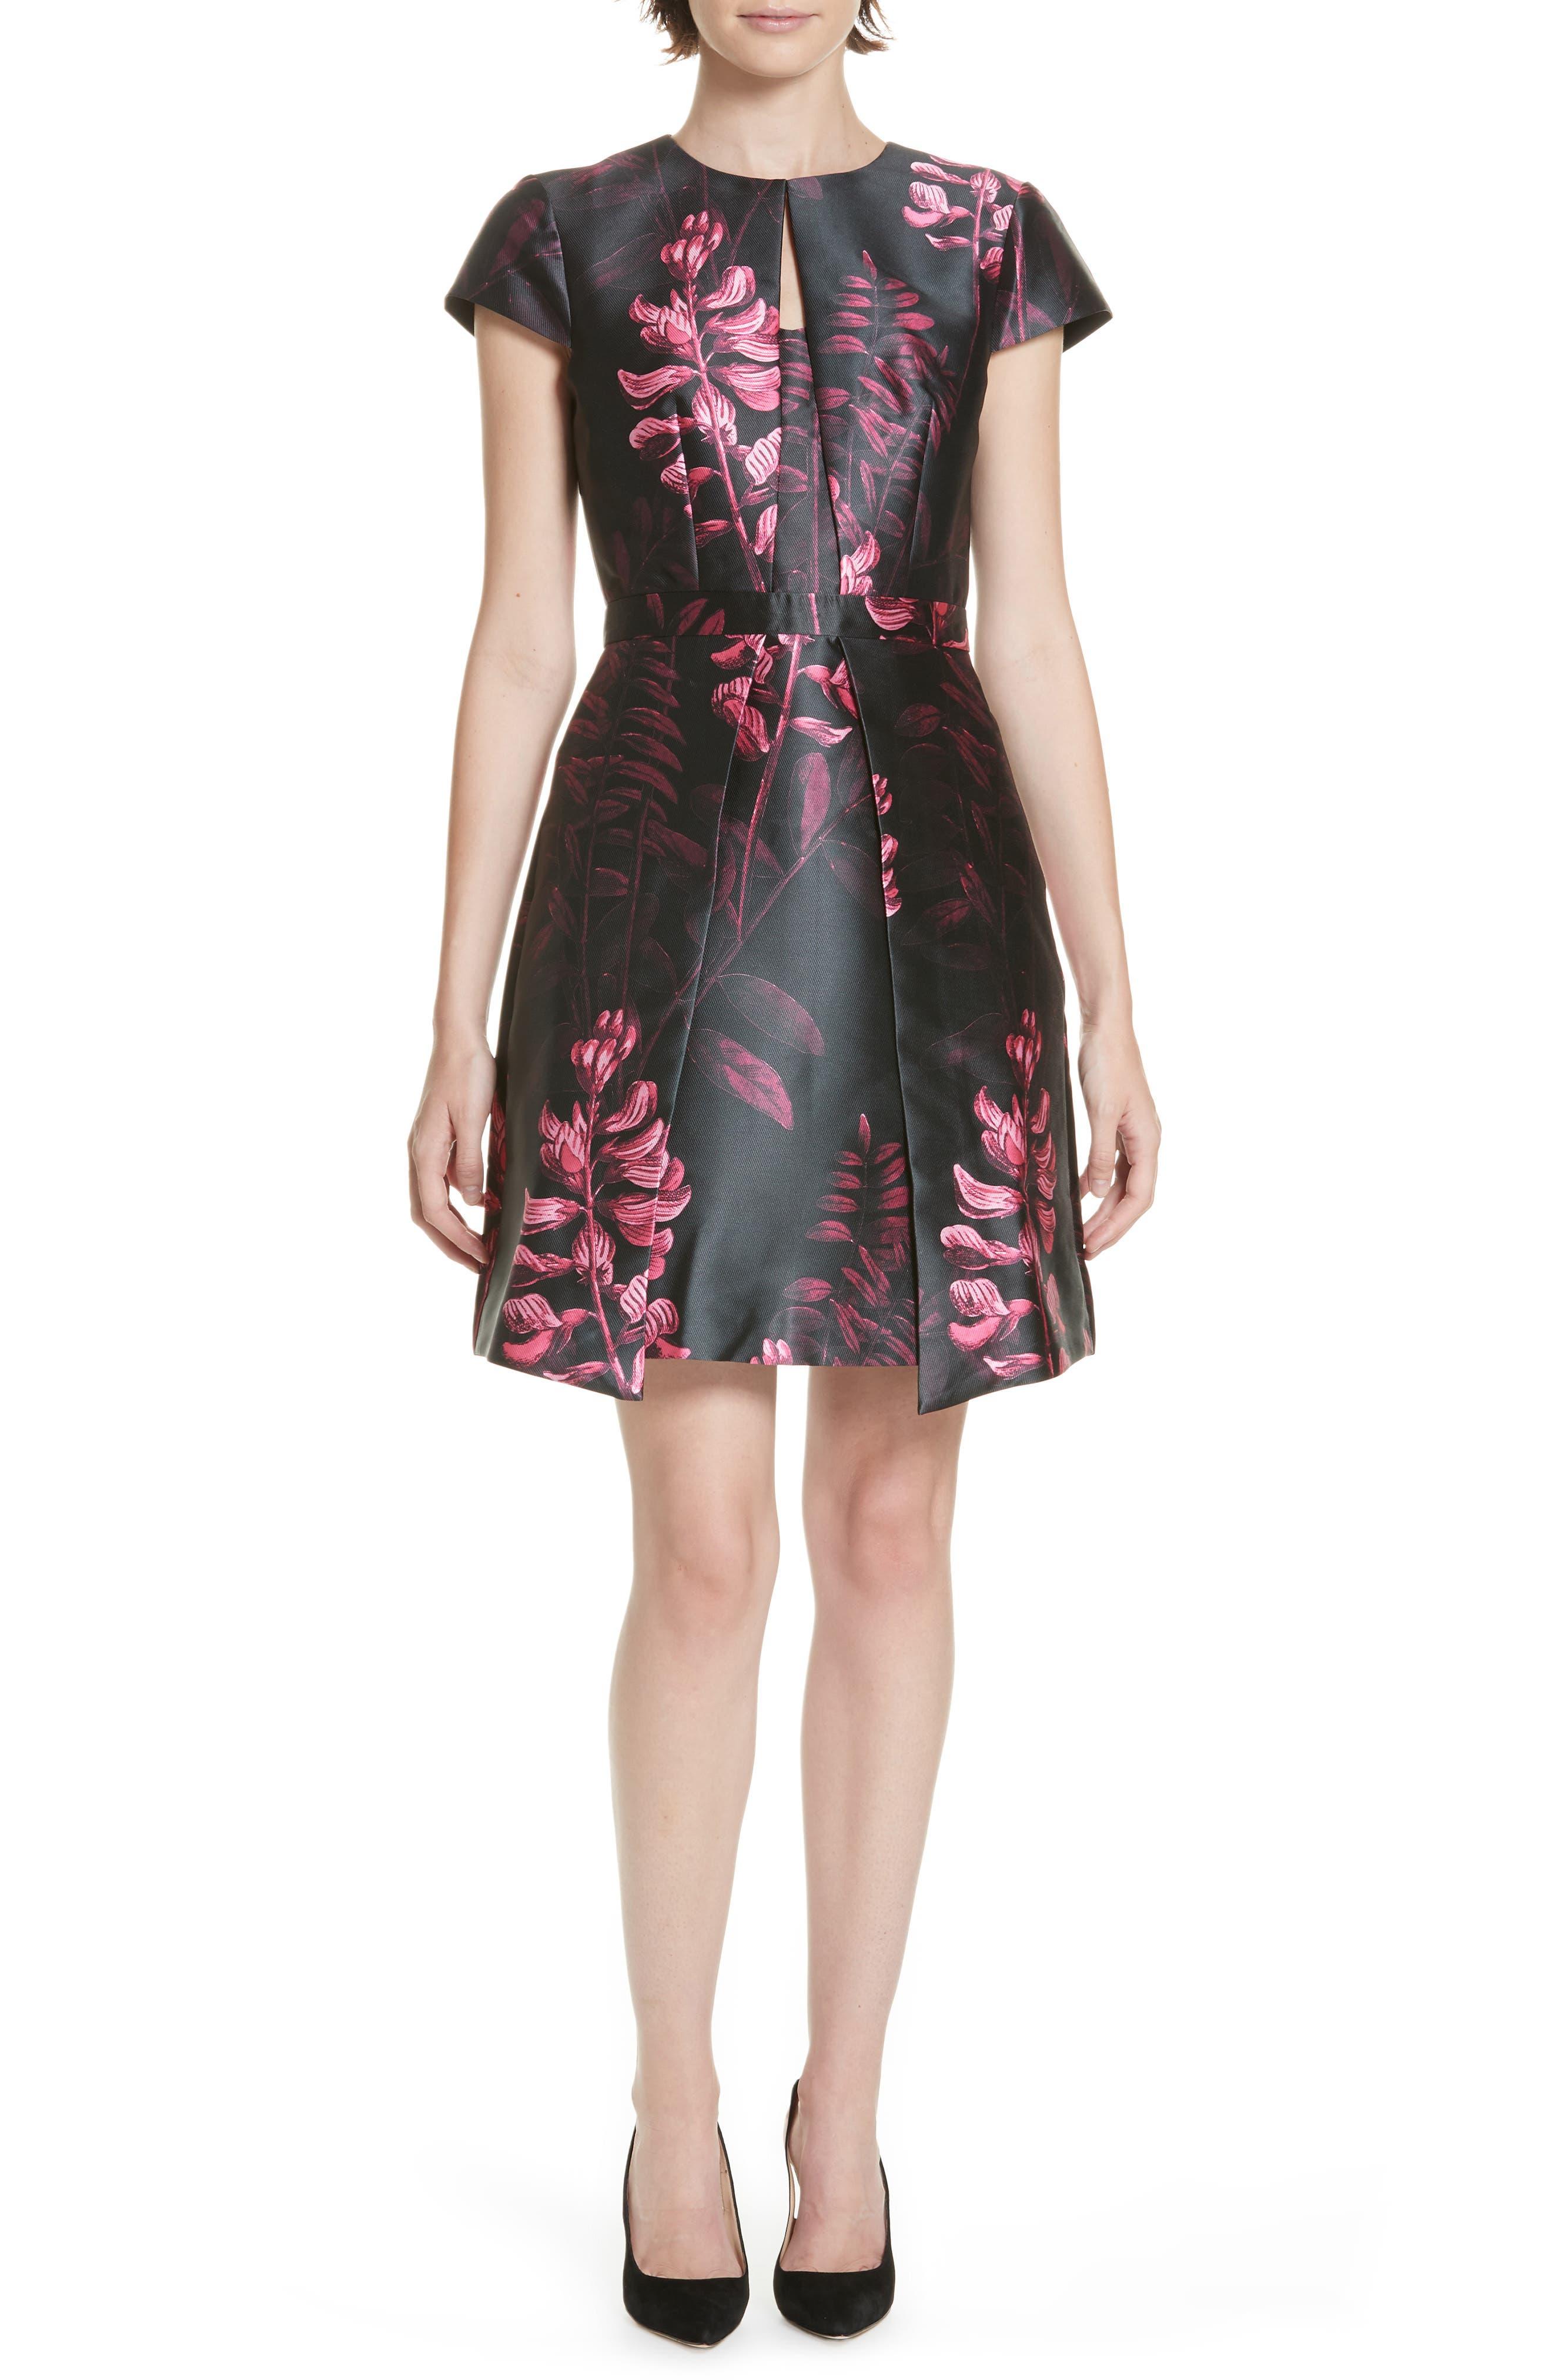 Jebby Splendor Jacquard Fit & Flare Dress,                         Main,                         color, 001